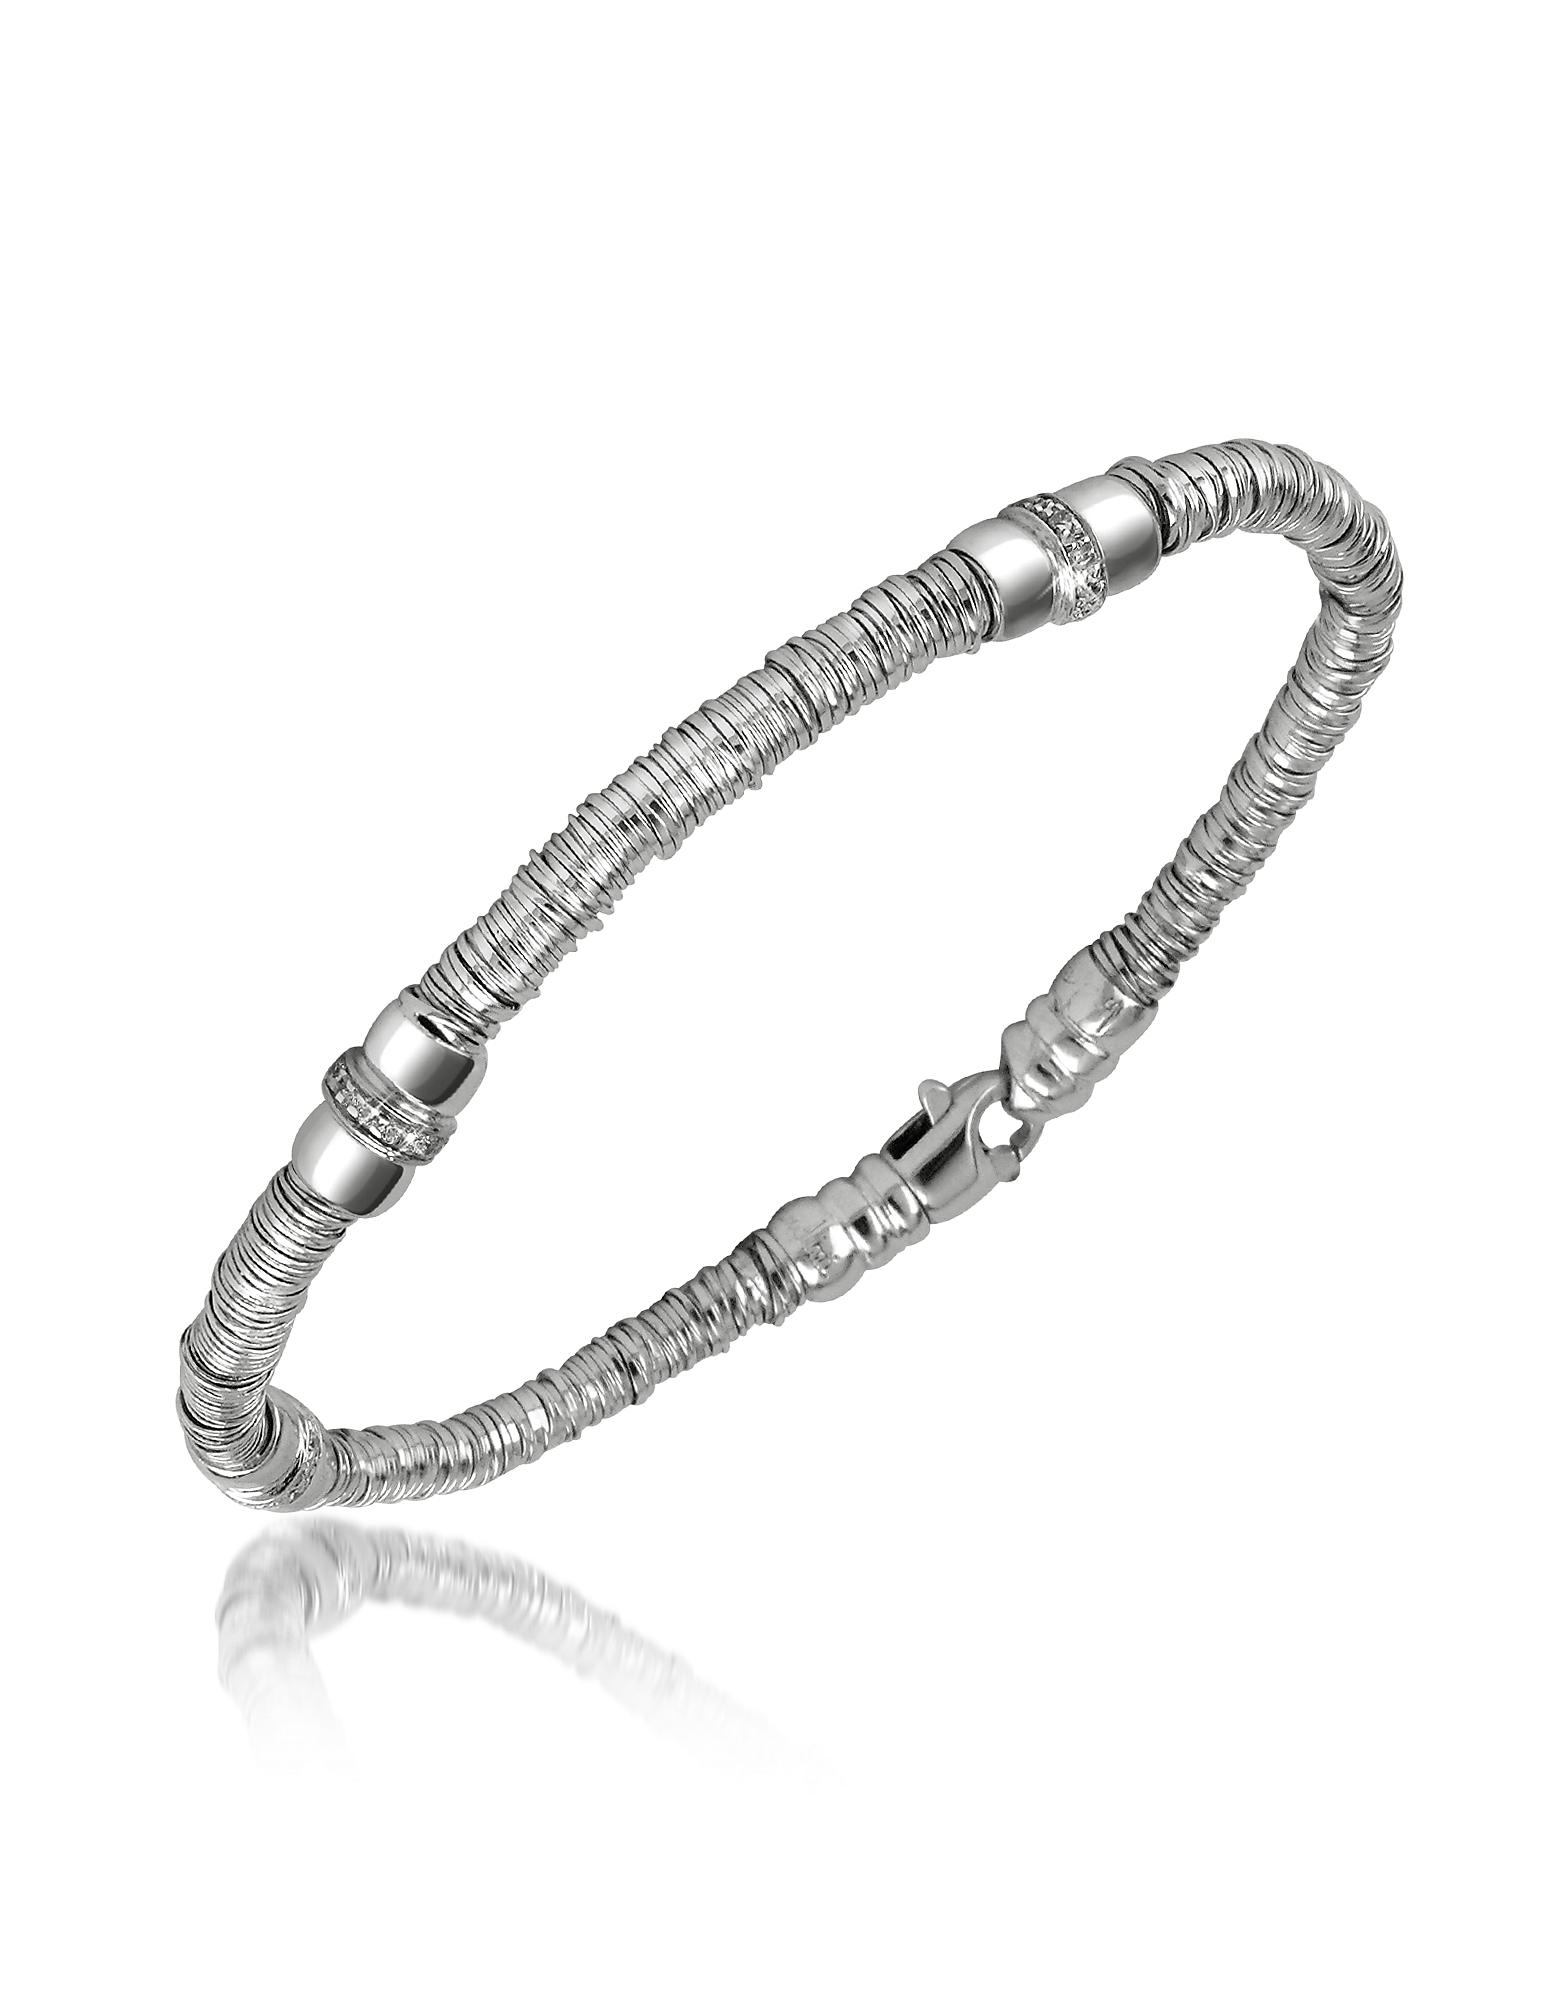 Orlando Orlandini Designer Bracelets, Capriccio - Diamond 18K White Gold Chain Snake Bracelet